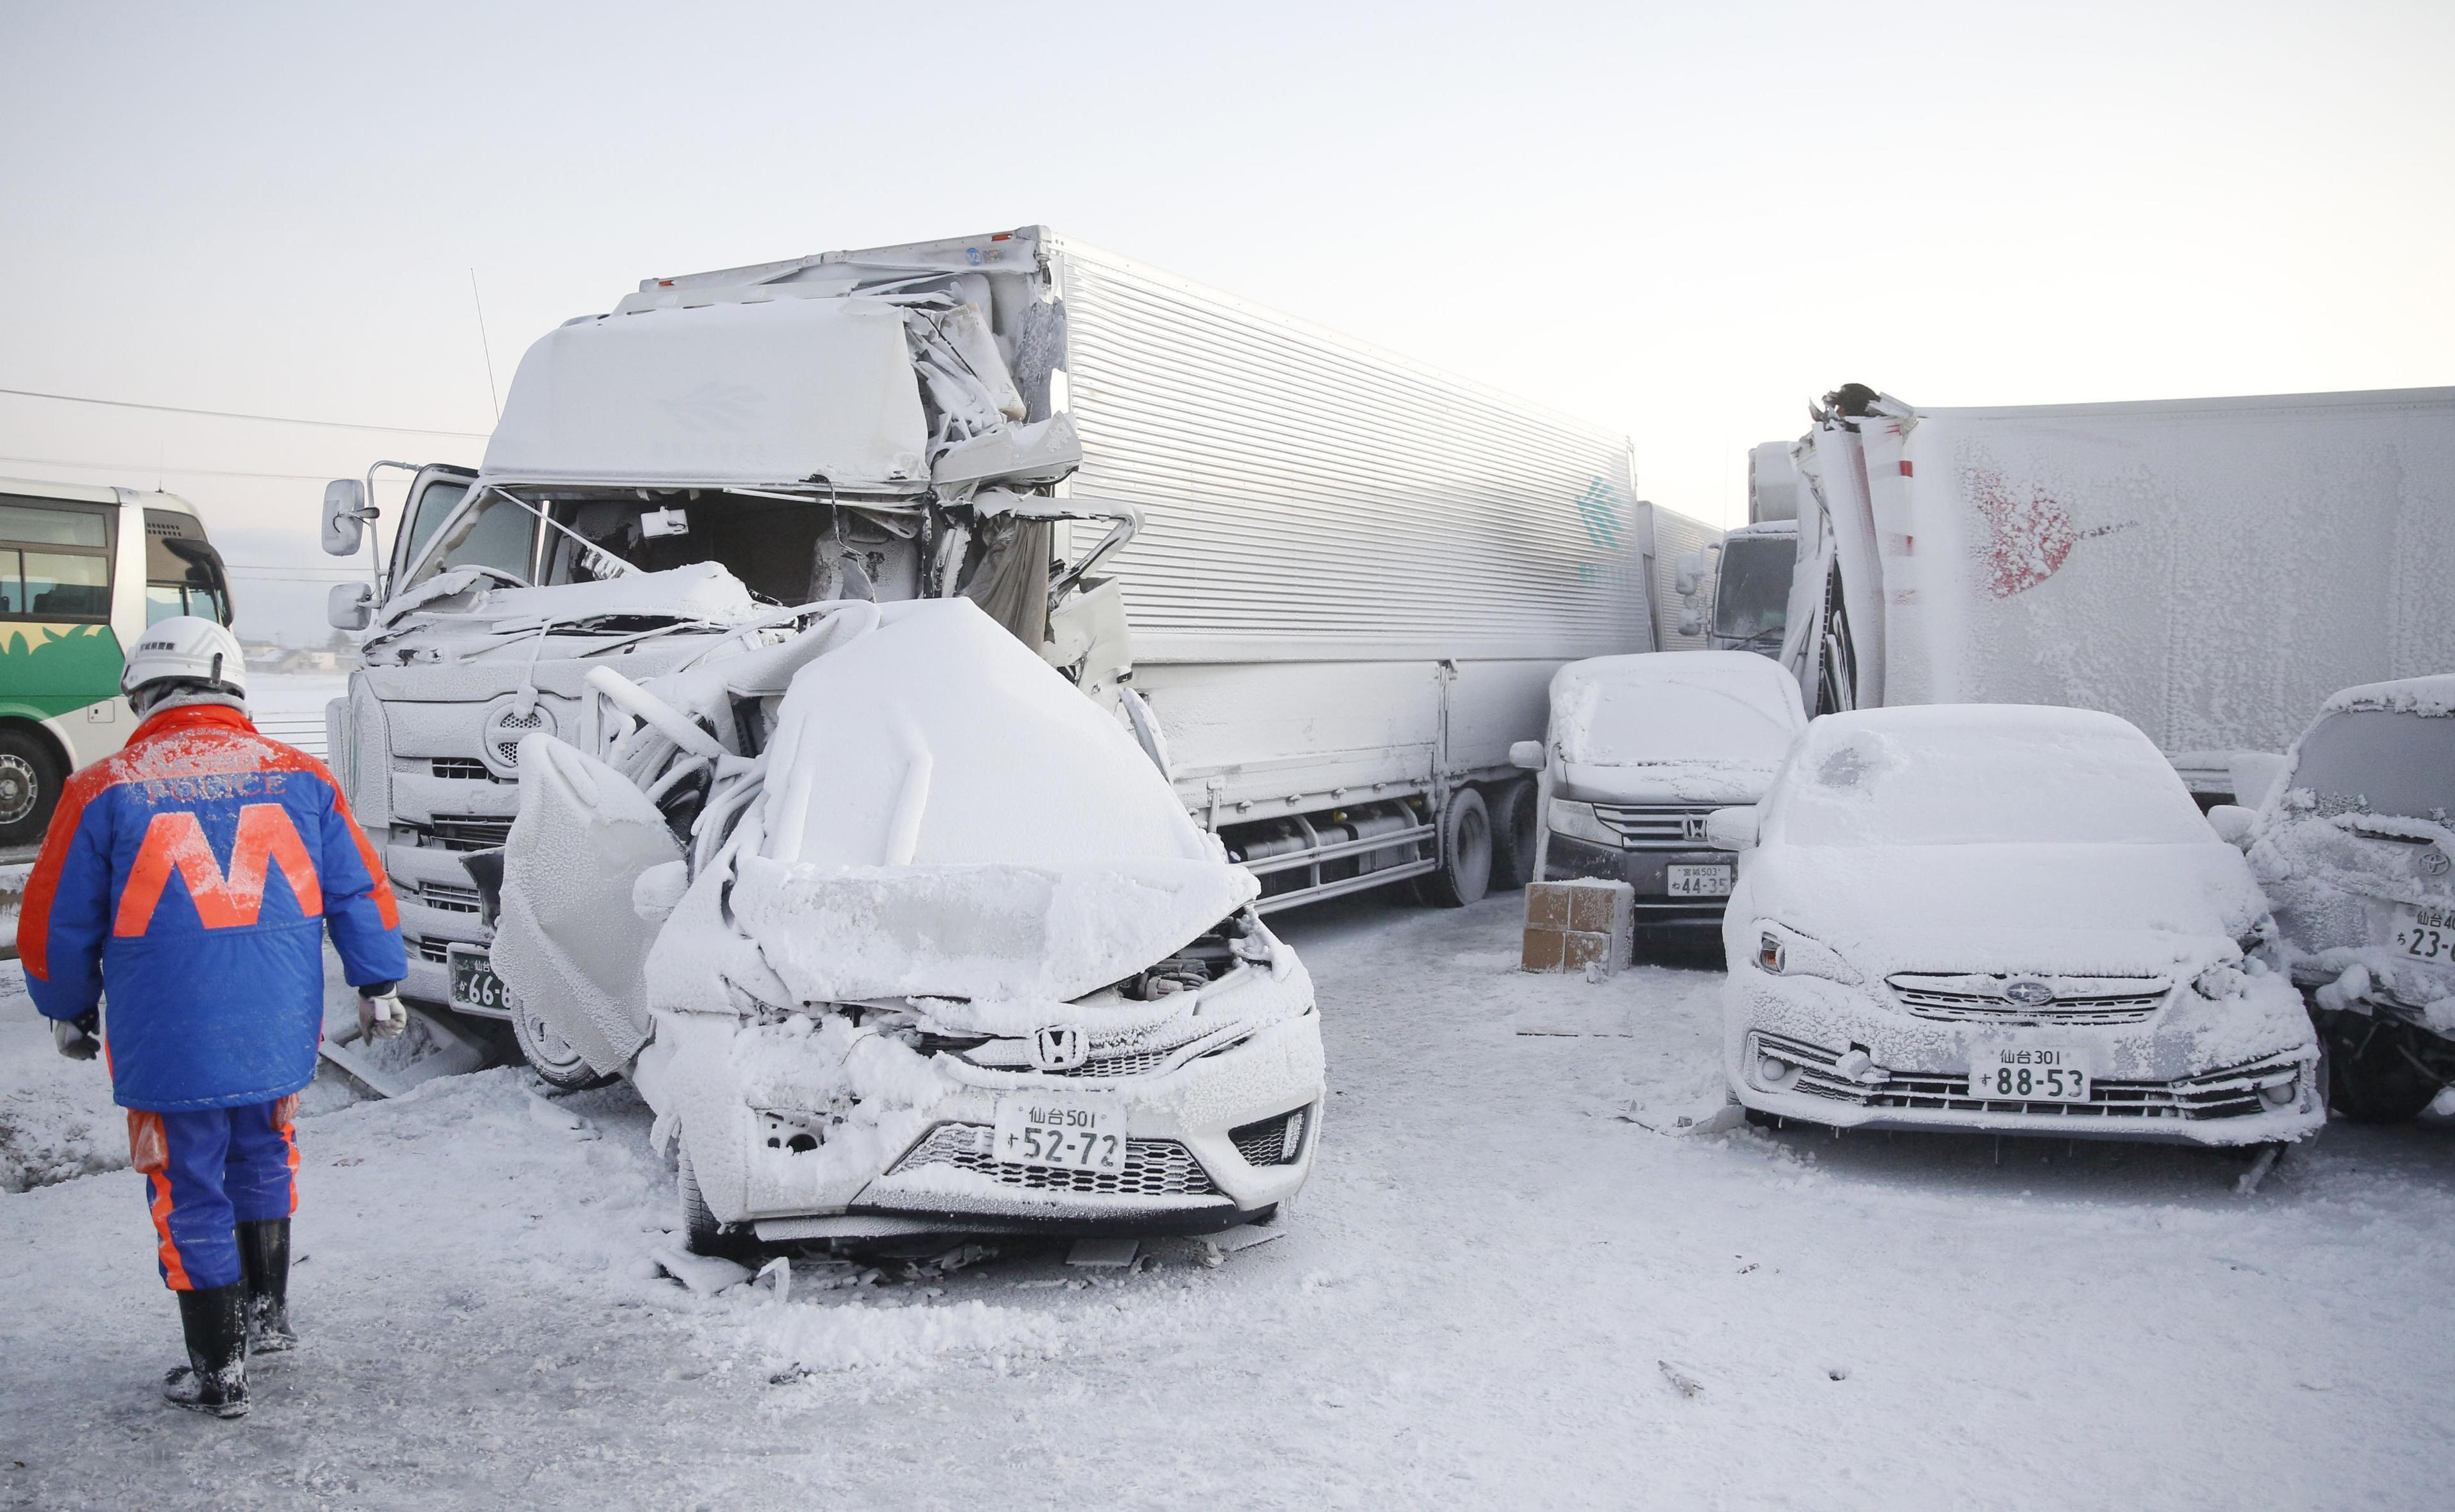 Japan Miyagi prefecture snow storm pile-up